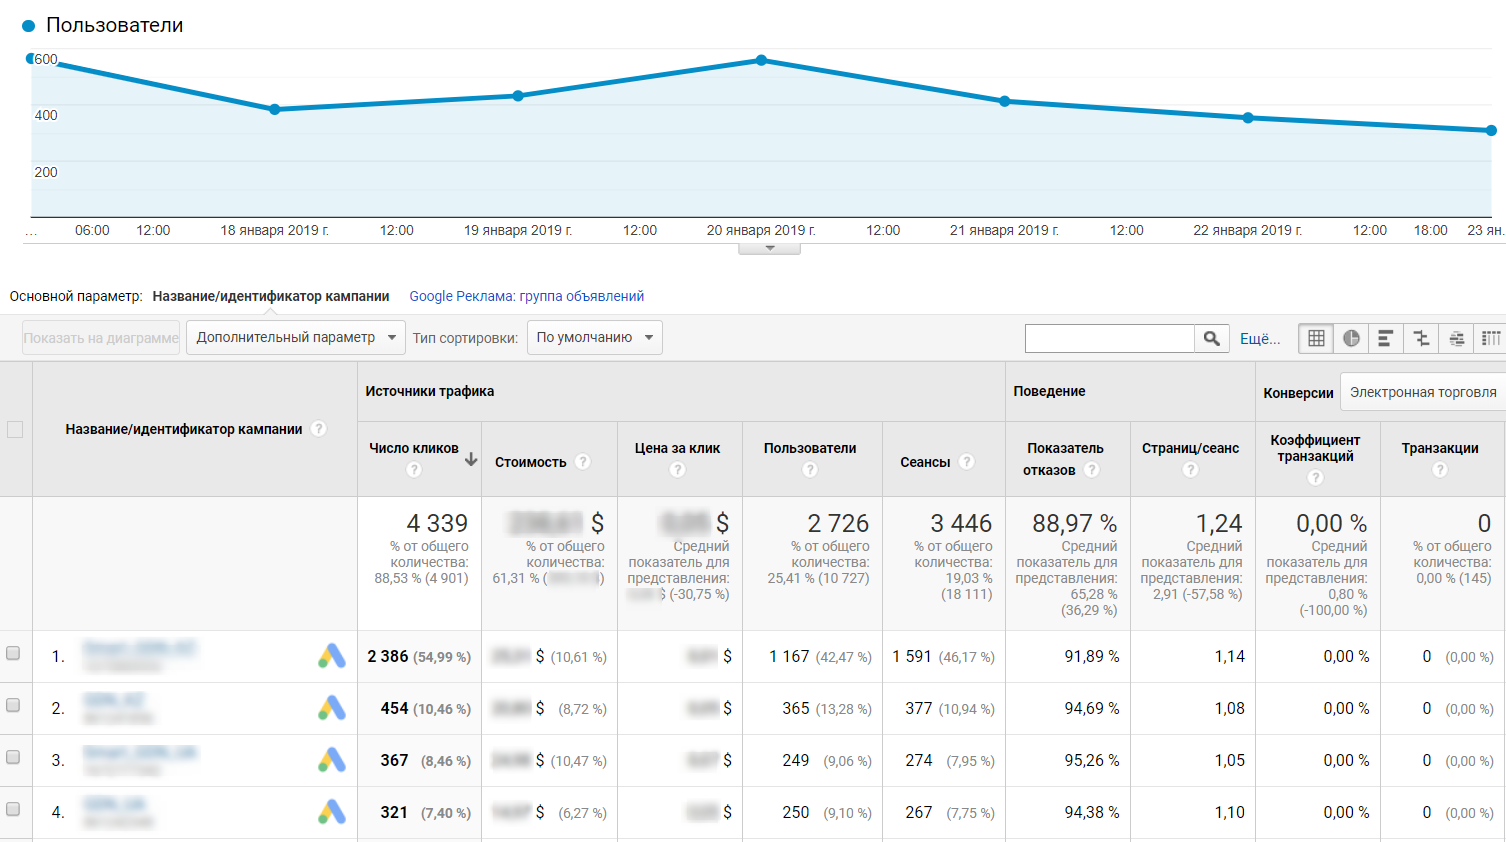 Статистика PPC-рекламы, аналитика